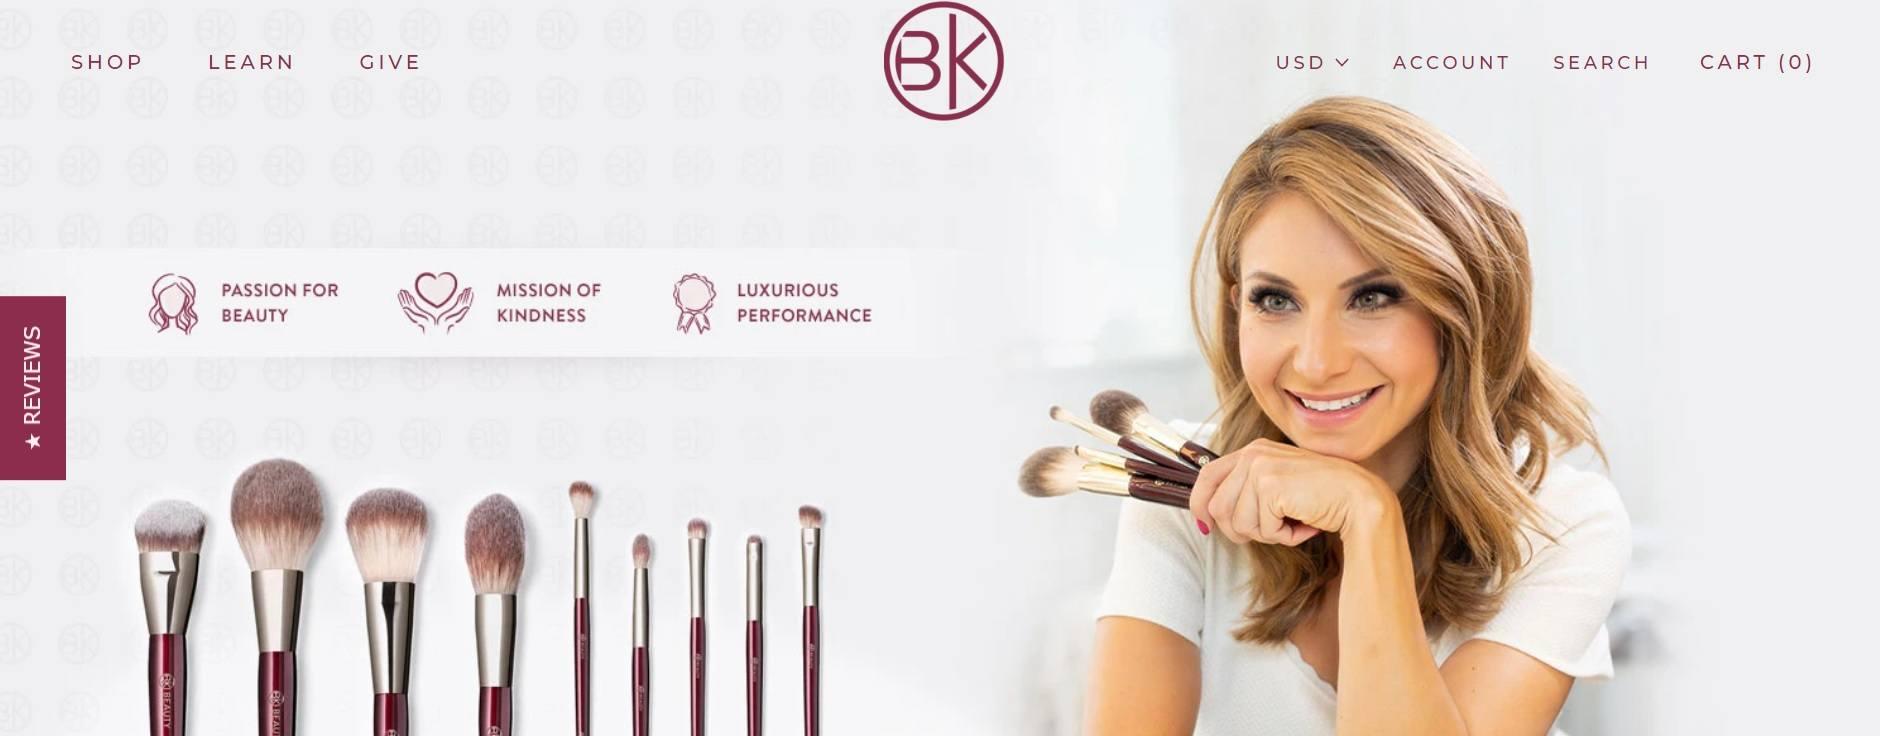 BK Beauty